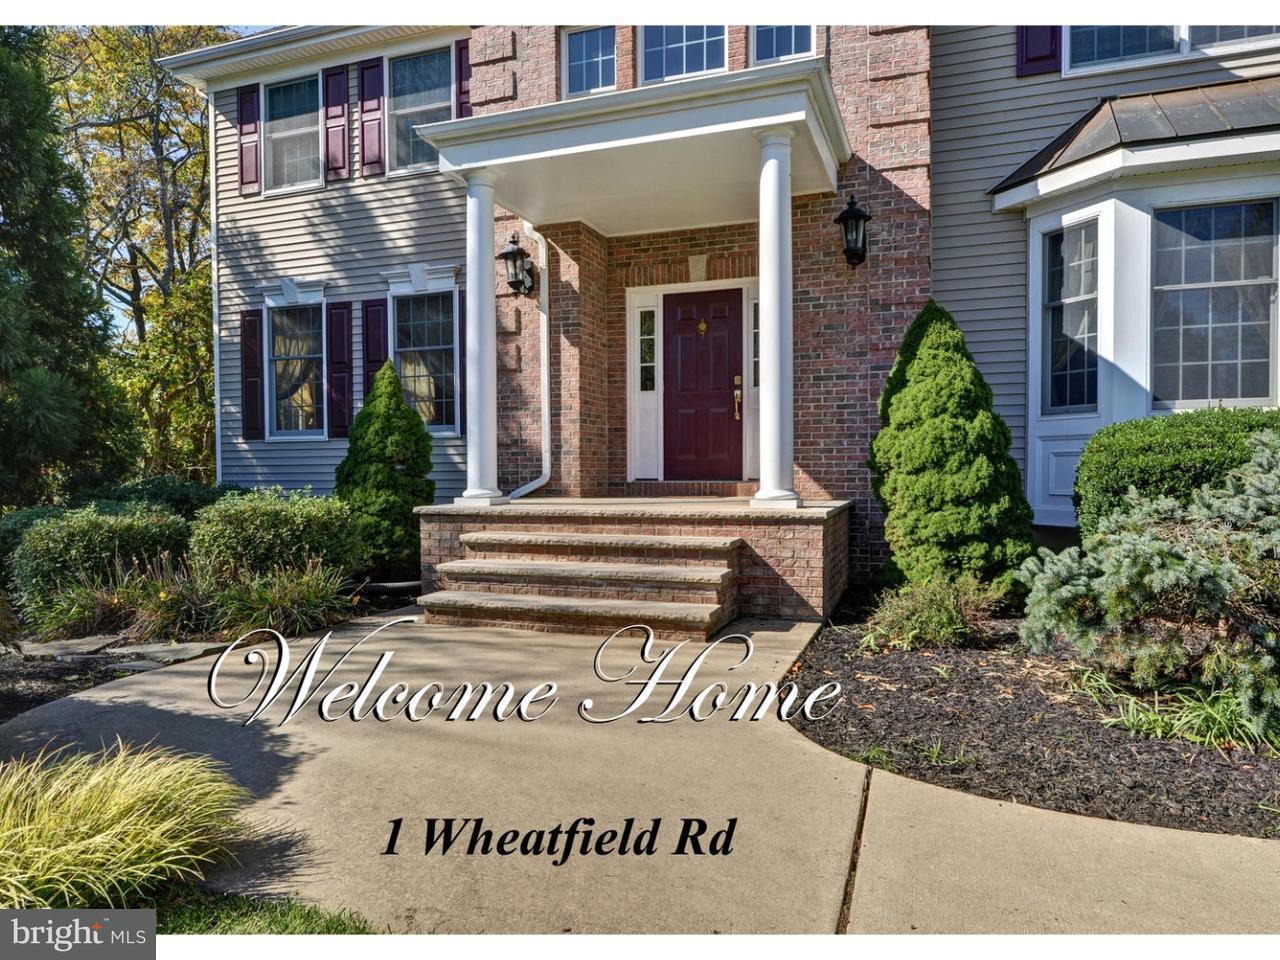 Single Family Home for Rent at 1 WHEATFIELD Road Cranbury, New Jersey 08512 United StatesMunicipality: Cranbury Township